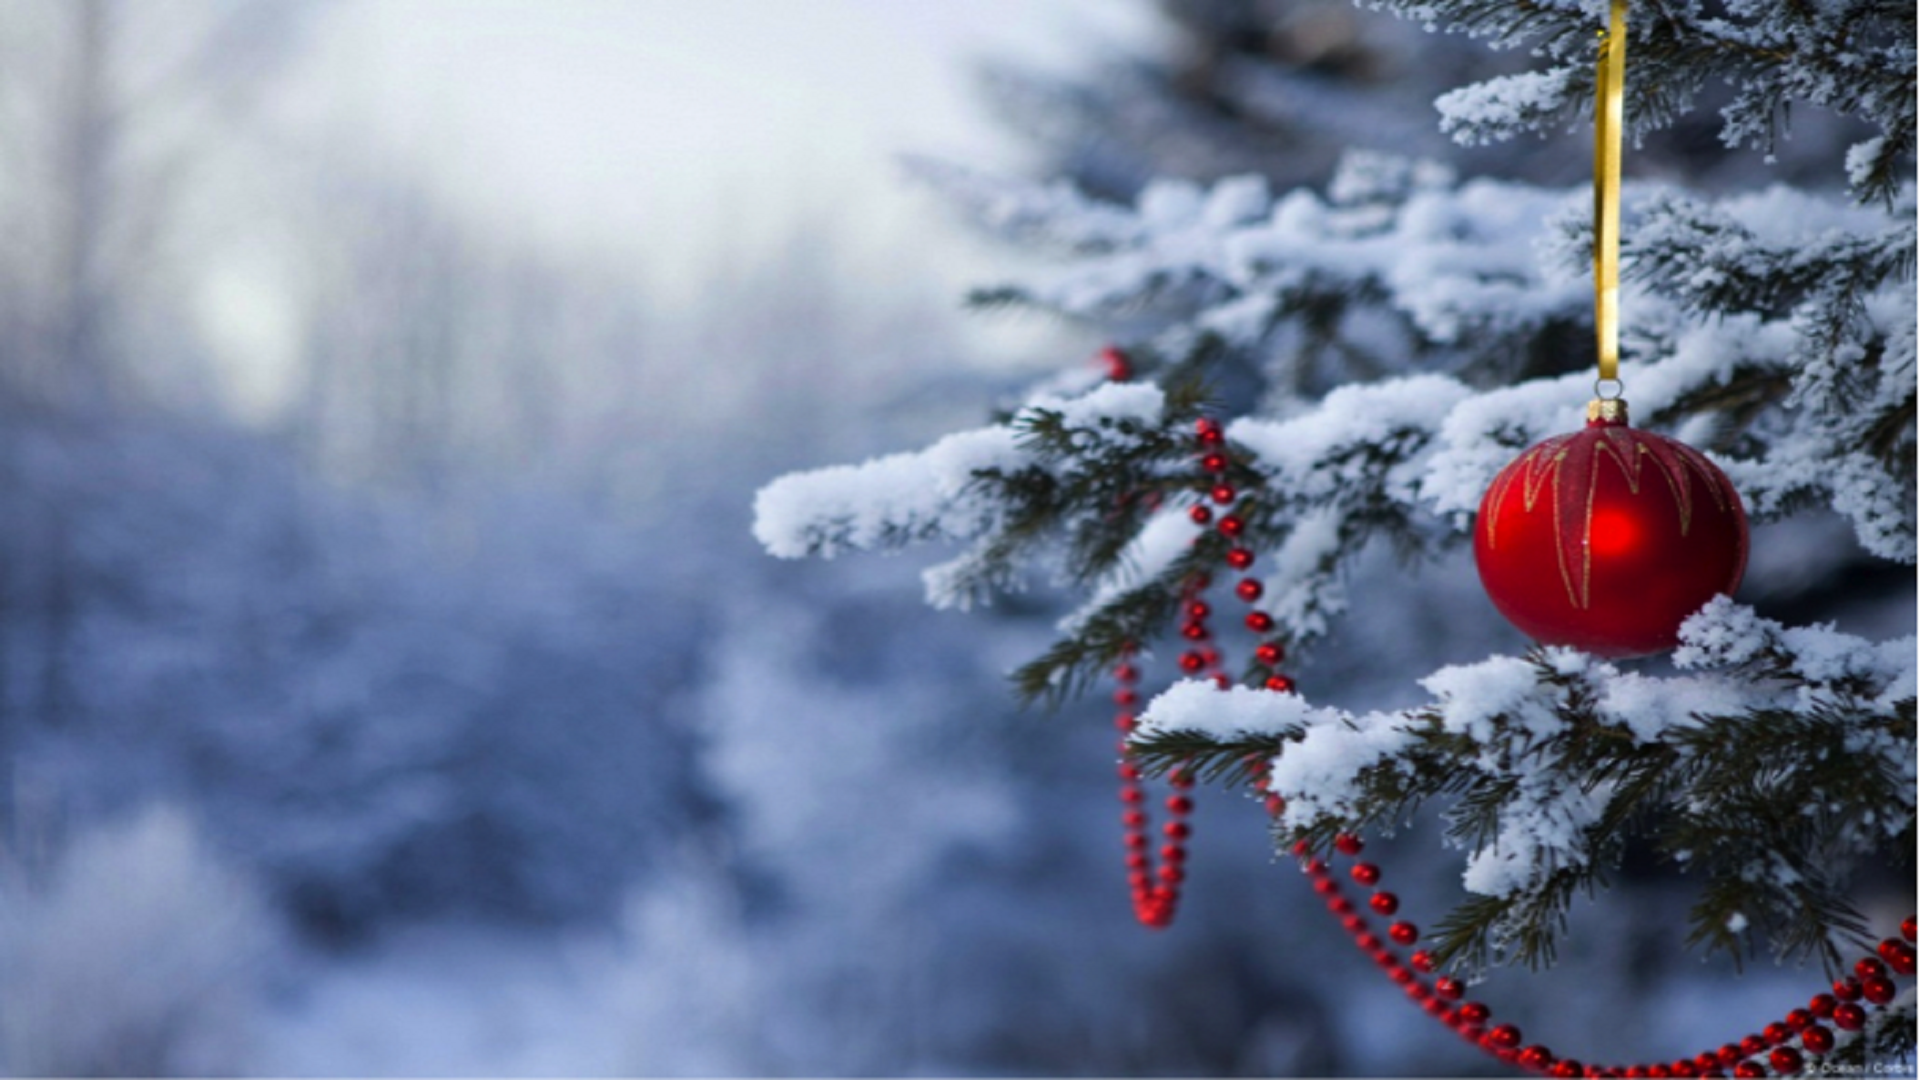 festive-christmas-tree-wallpaper-free-hd - hd wallpaper